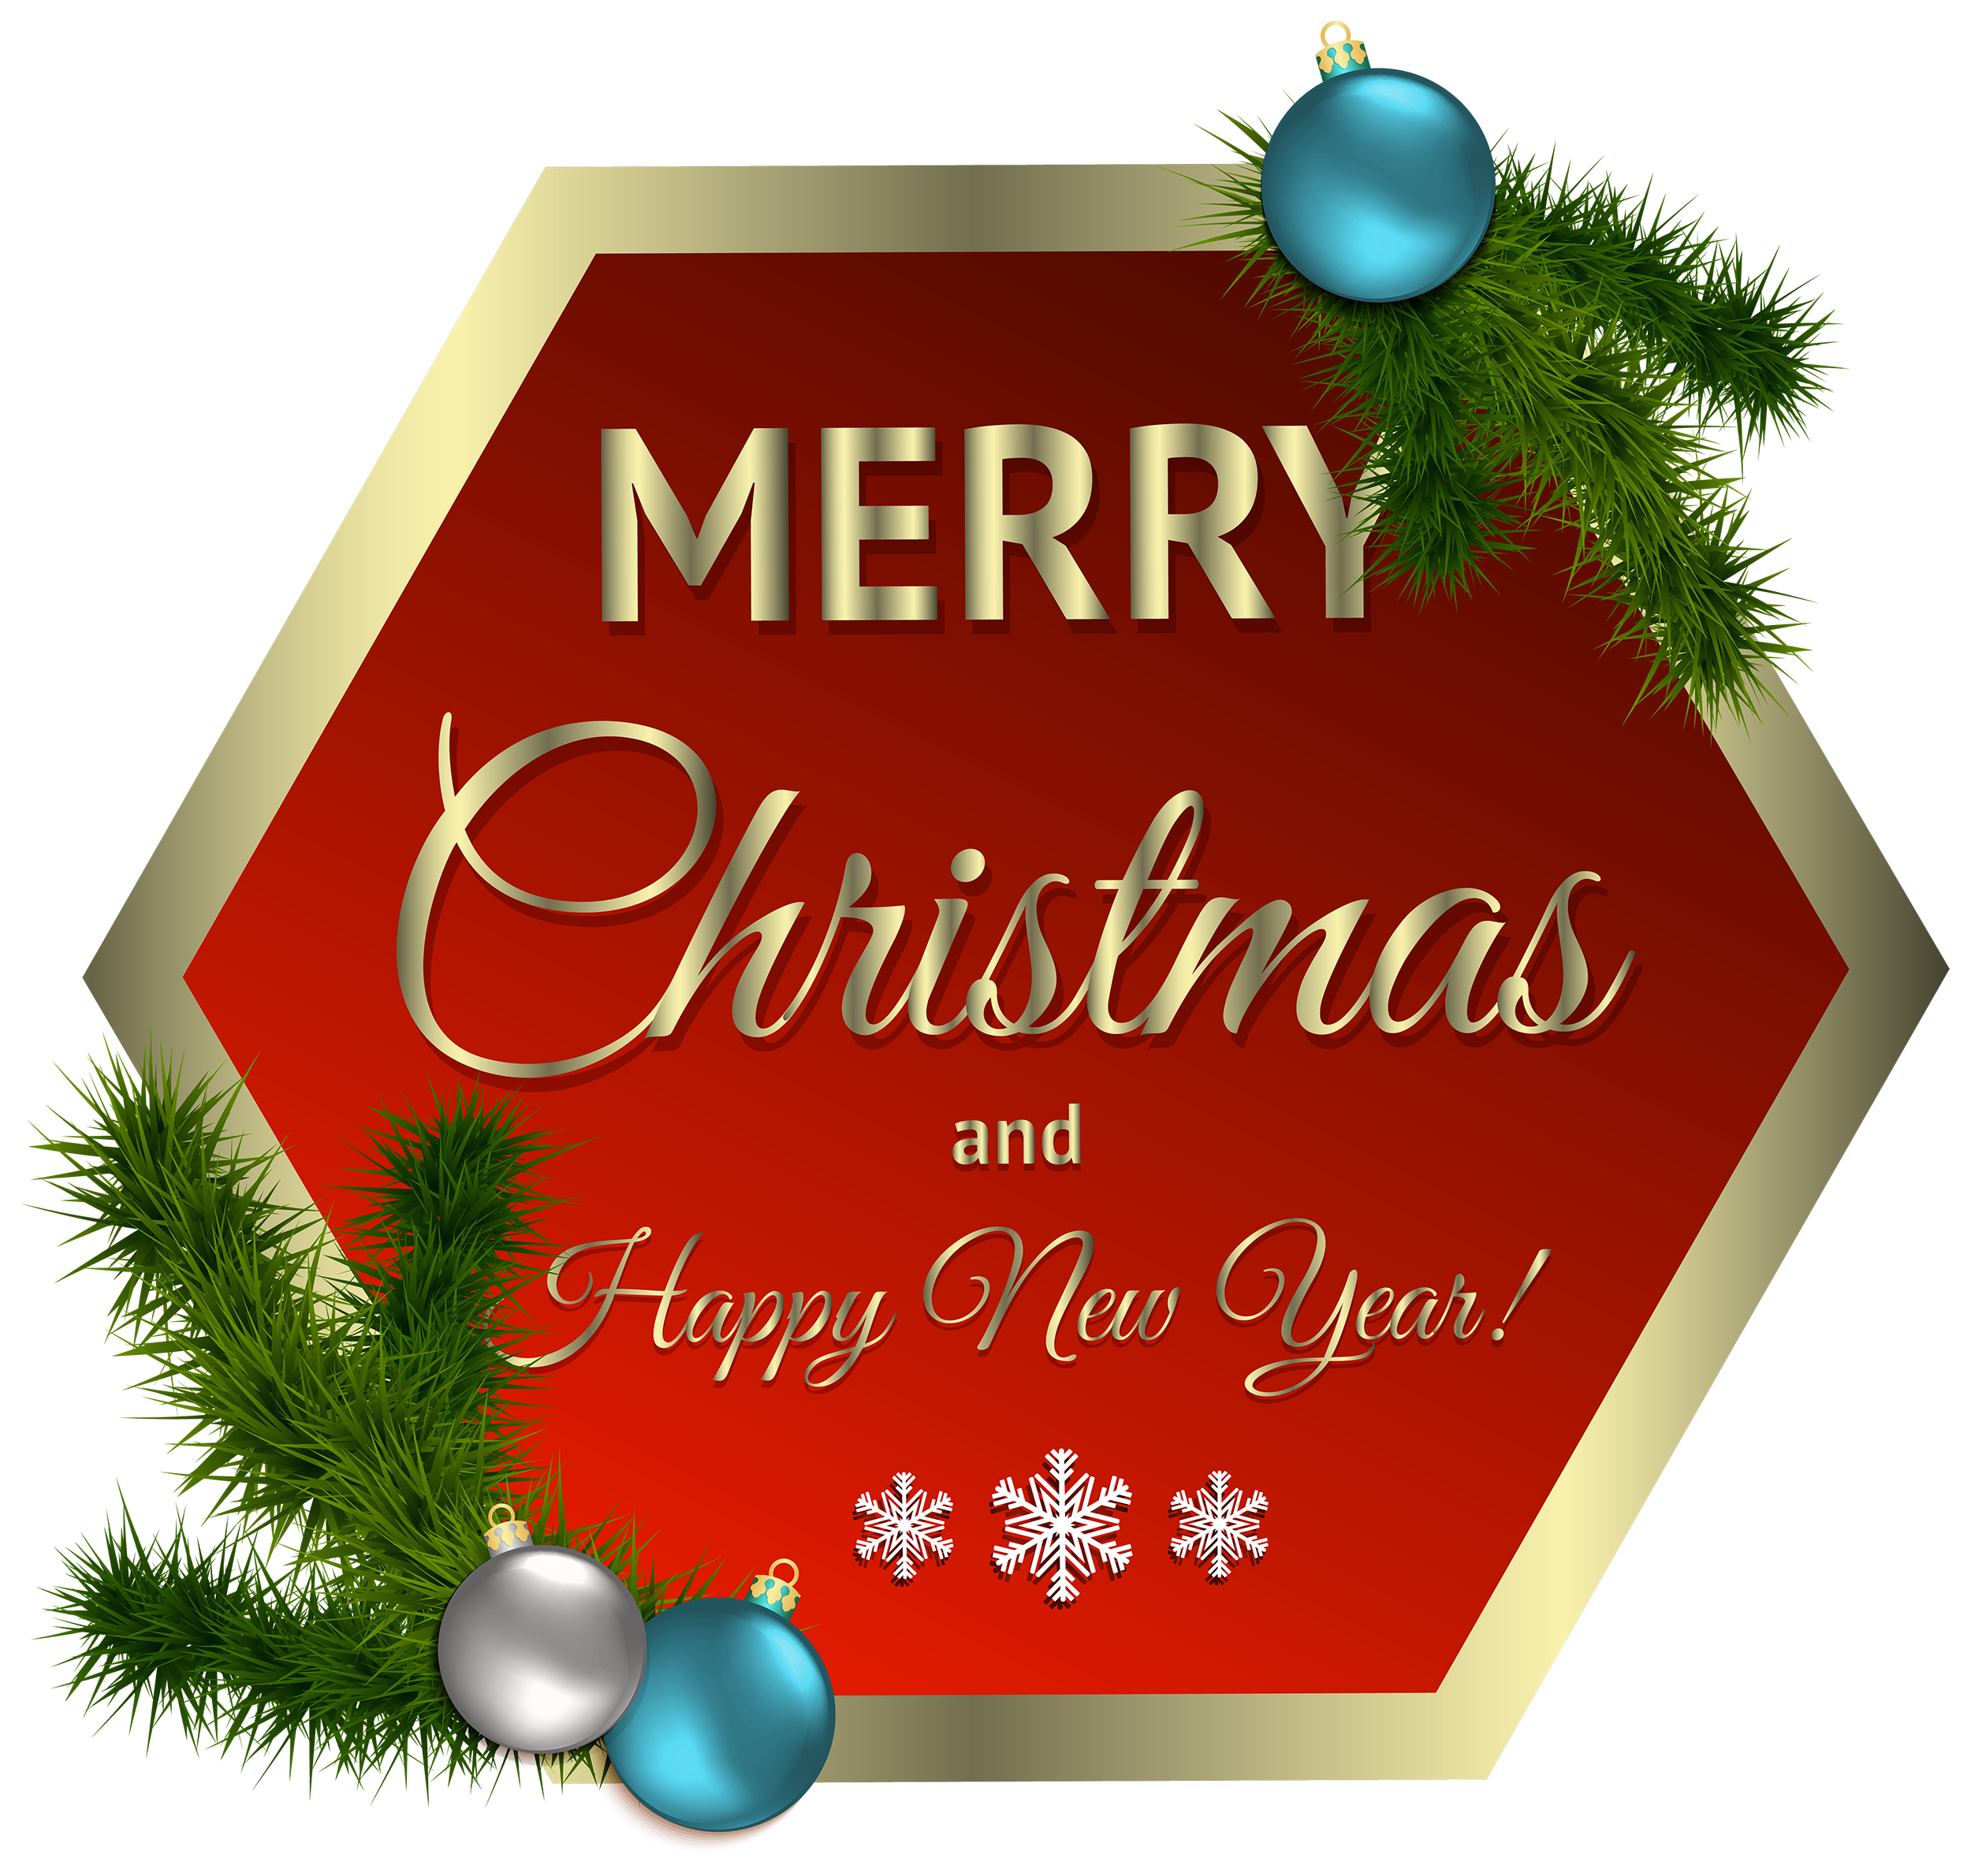 Christmas sayings clipart jpg royalty free download Pin by Antonia Mendez on ETIQUETAS DE NAVIDAD   Pinterest jpg royalty free download